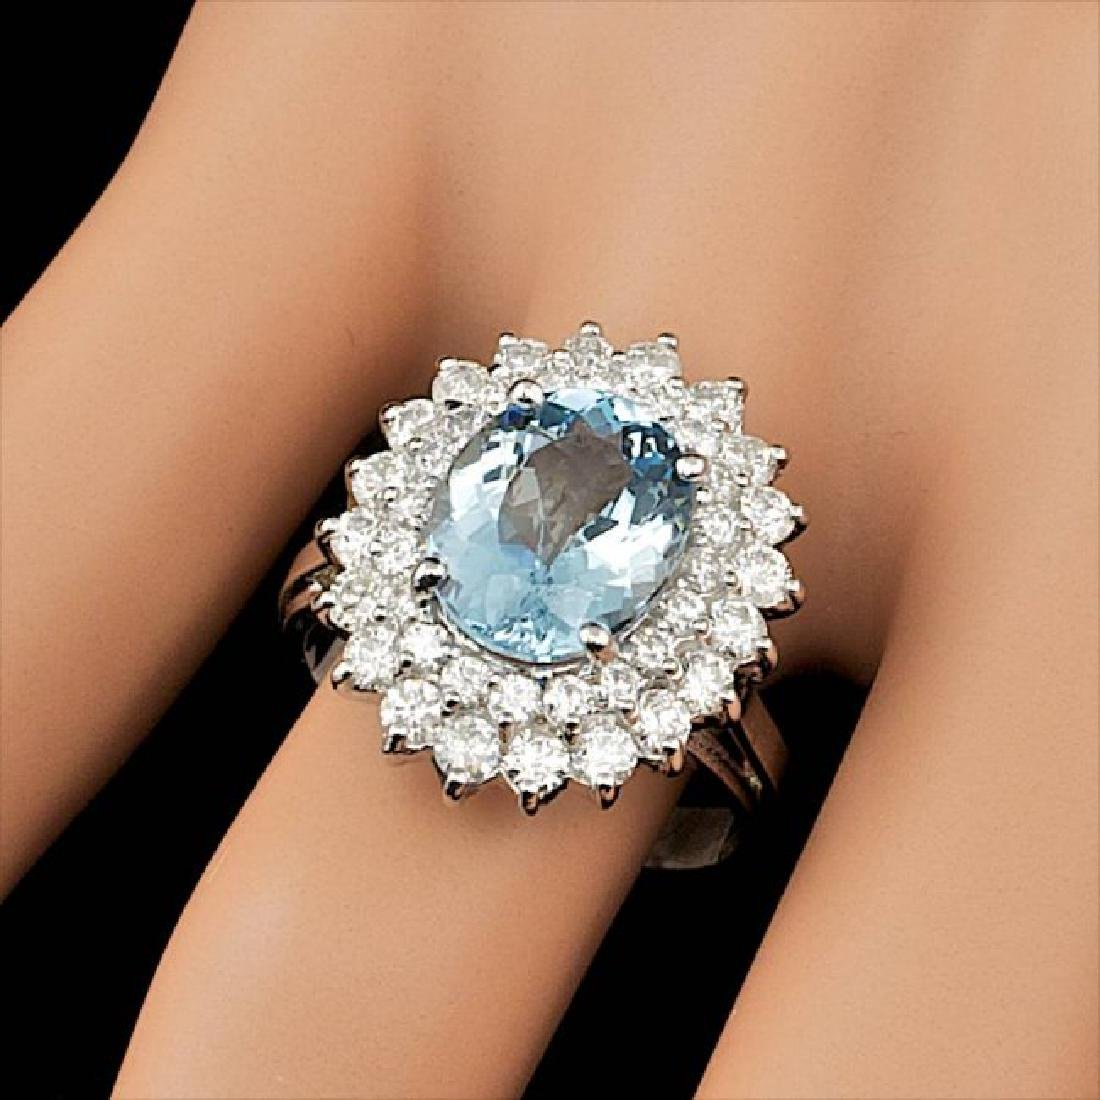 14k Gold 3.00ct Aquamarine 1.60ct Diamond Ring - 5